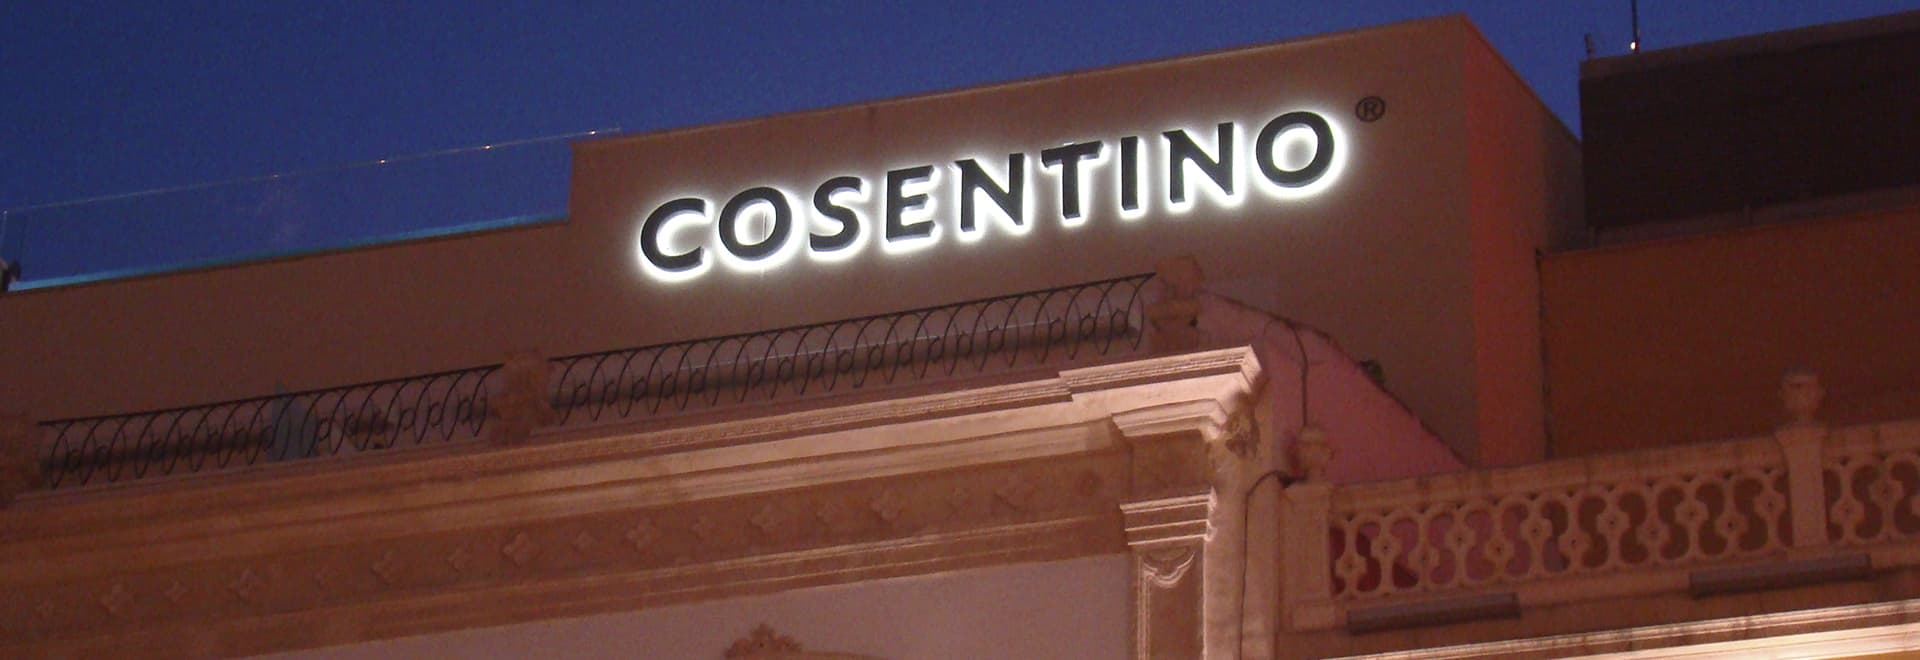 6 Rótulos Cosentino (2) (1)